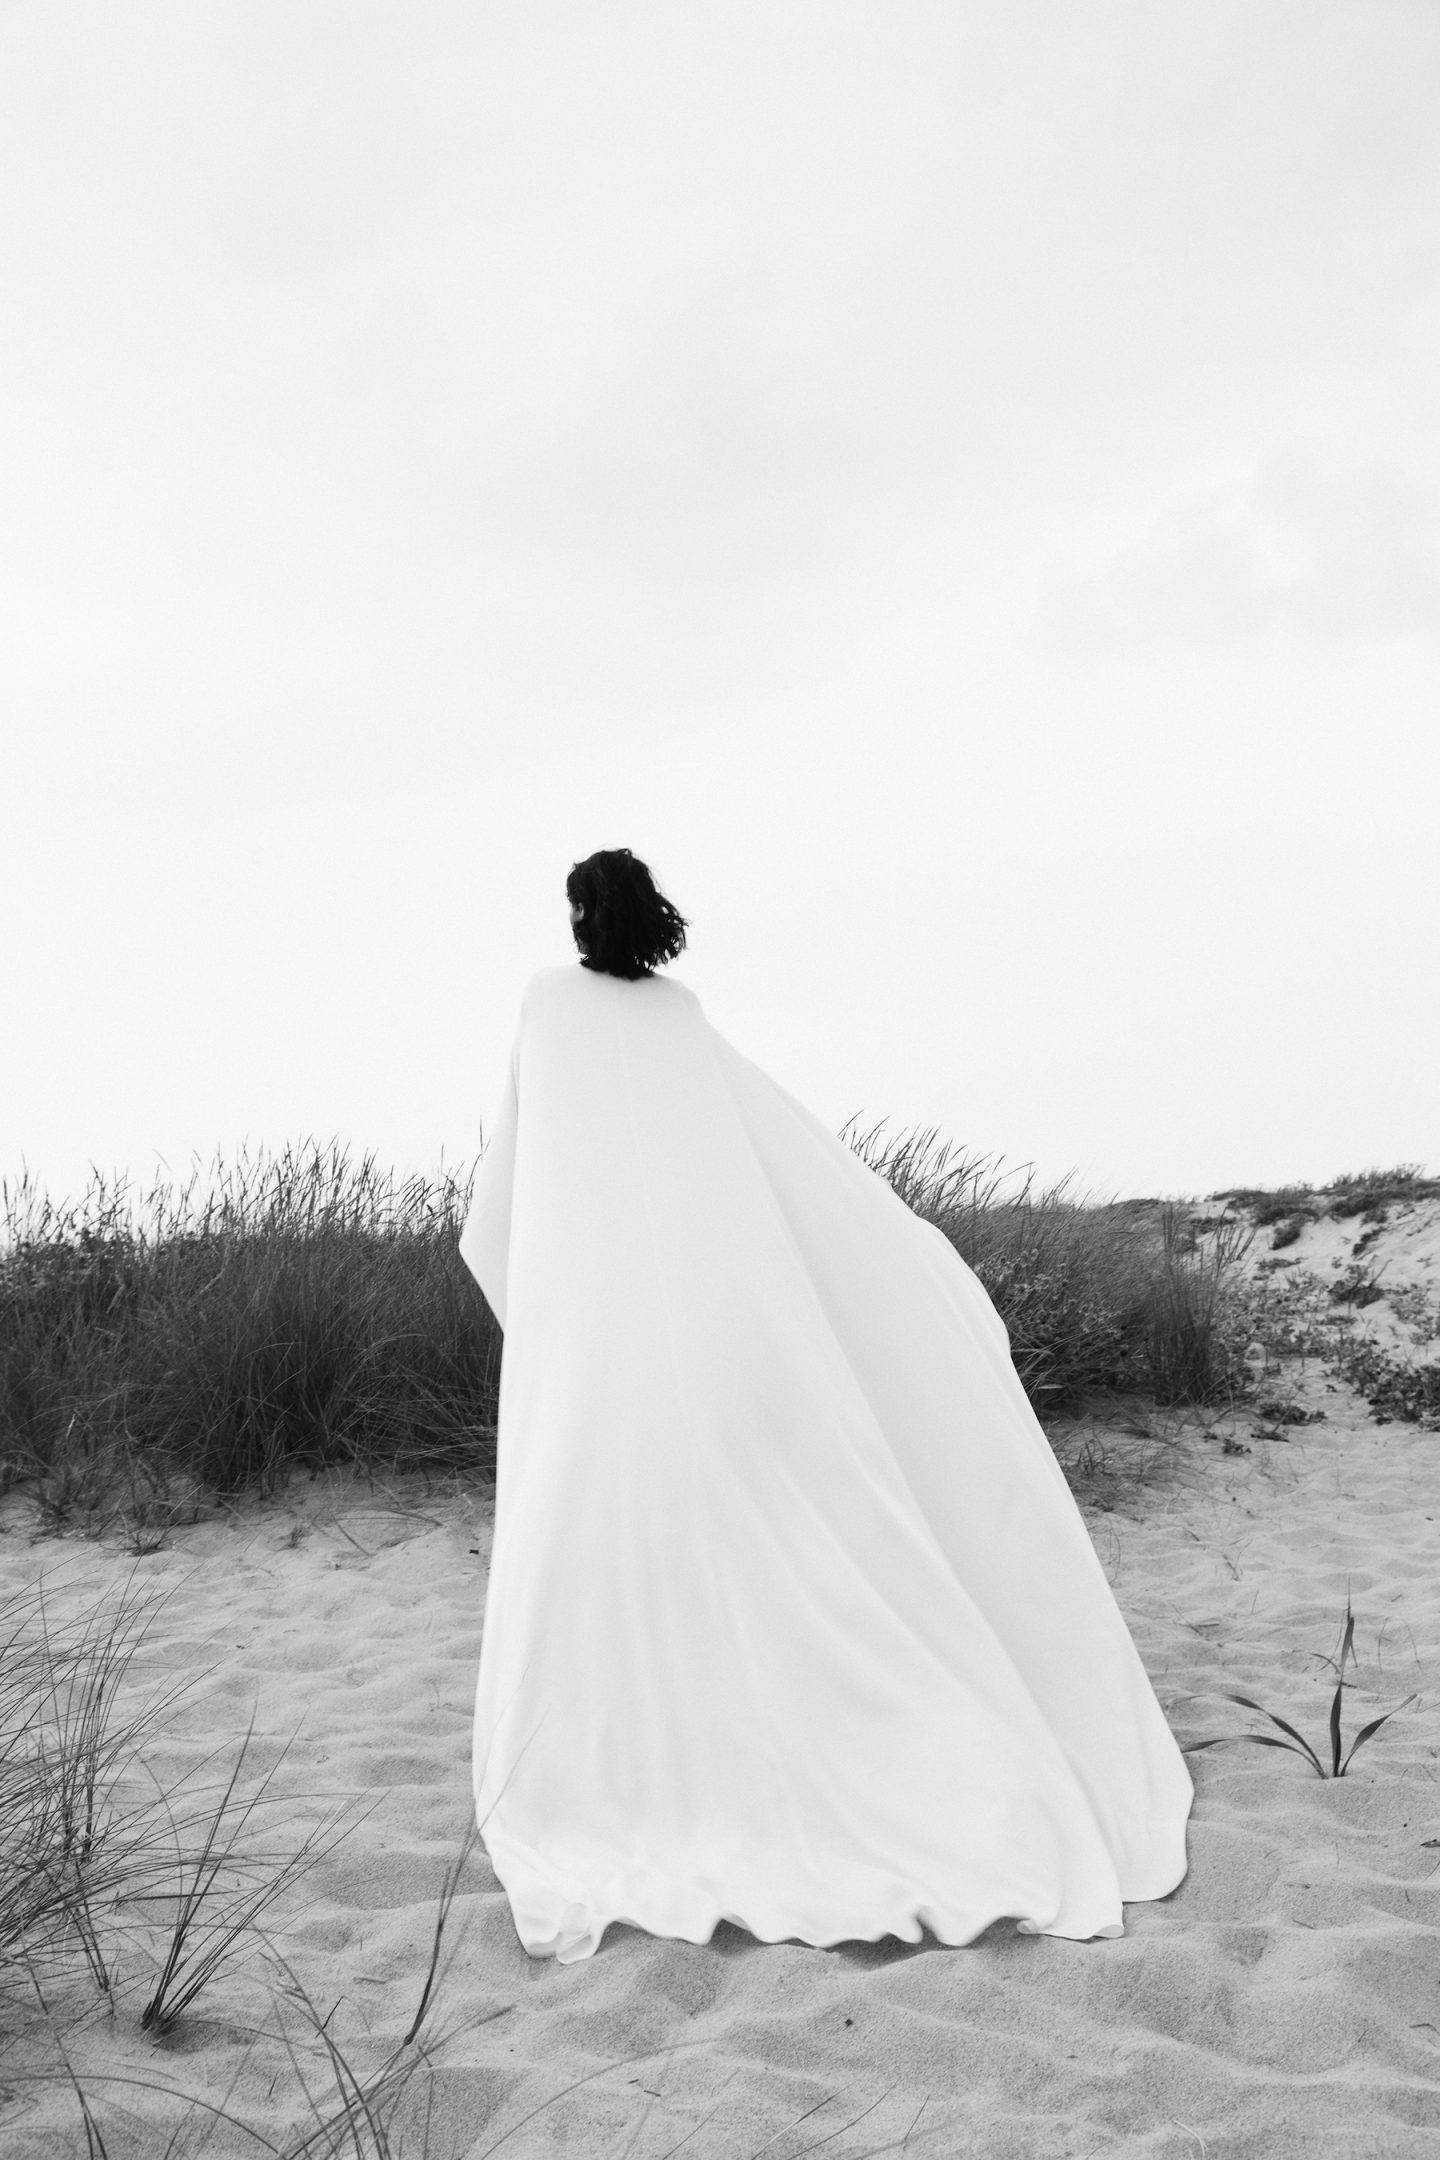 IGNANT-Photography-Thea-Lovstad-07